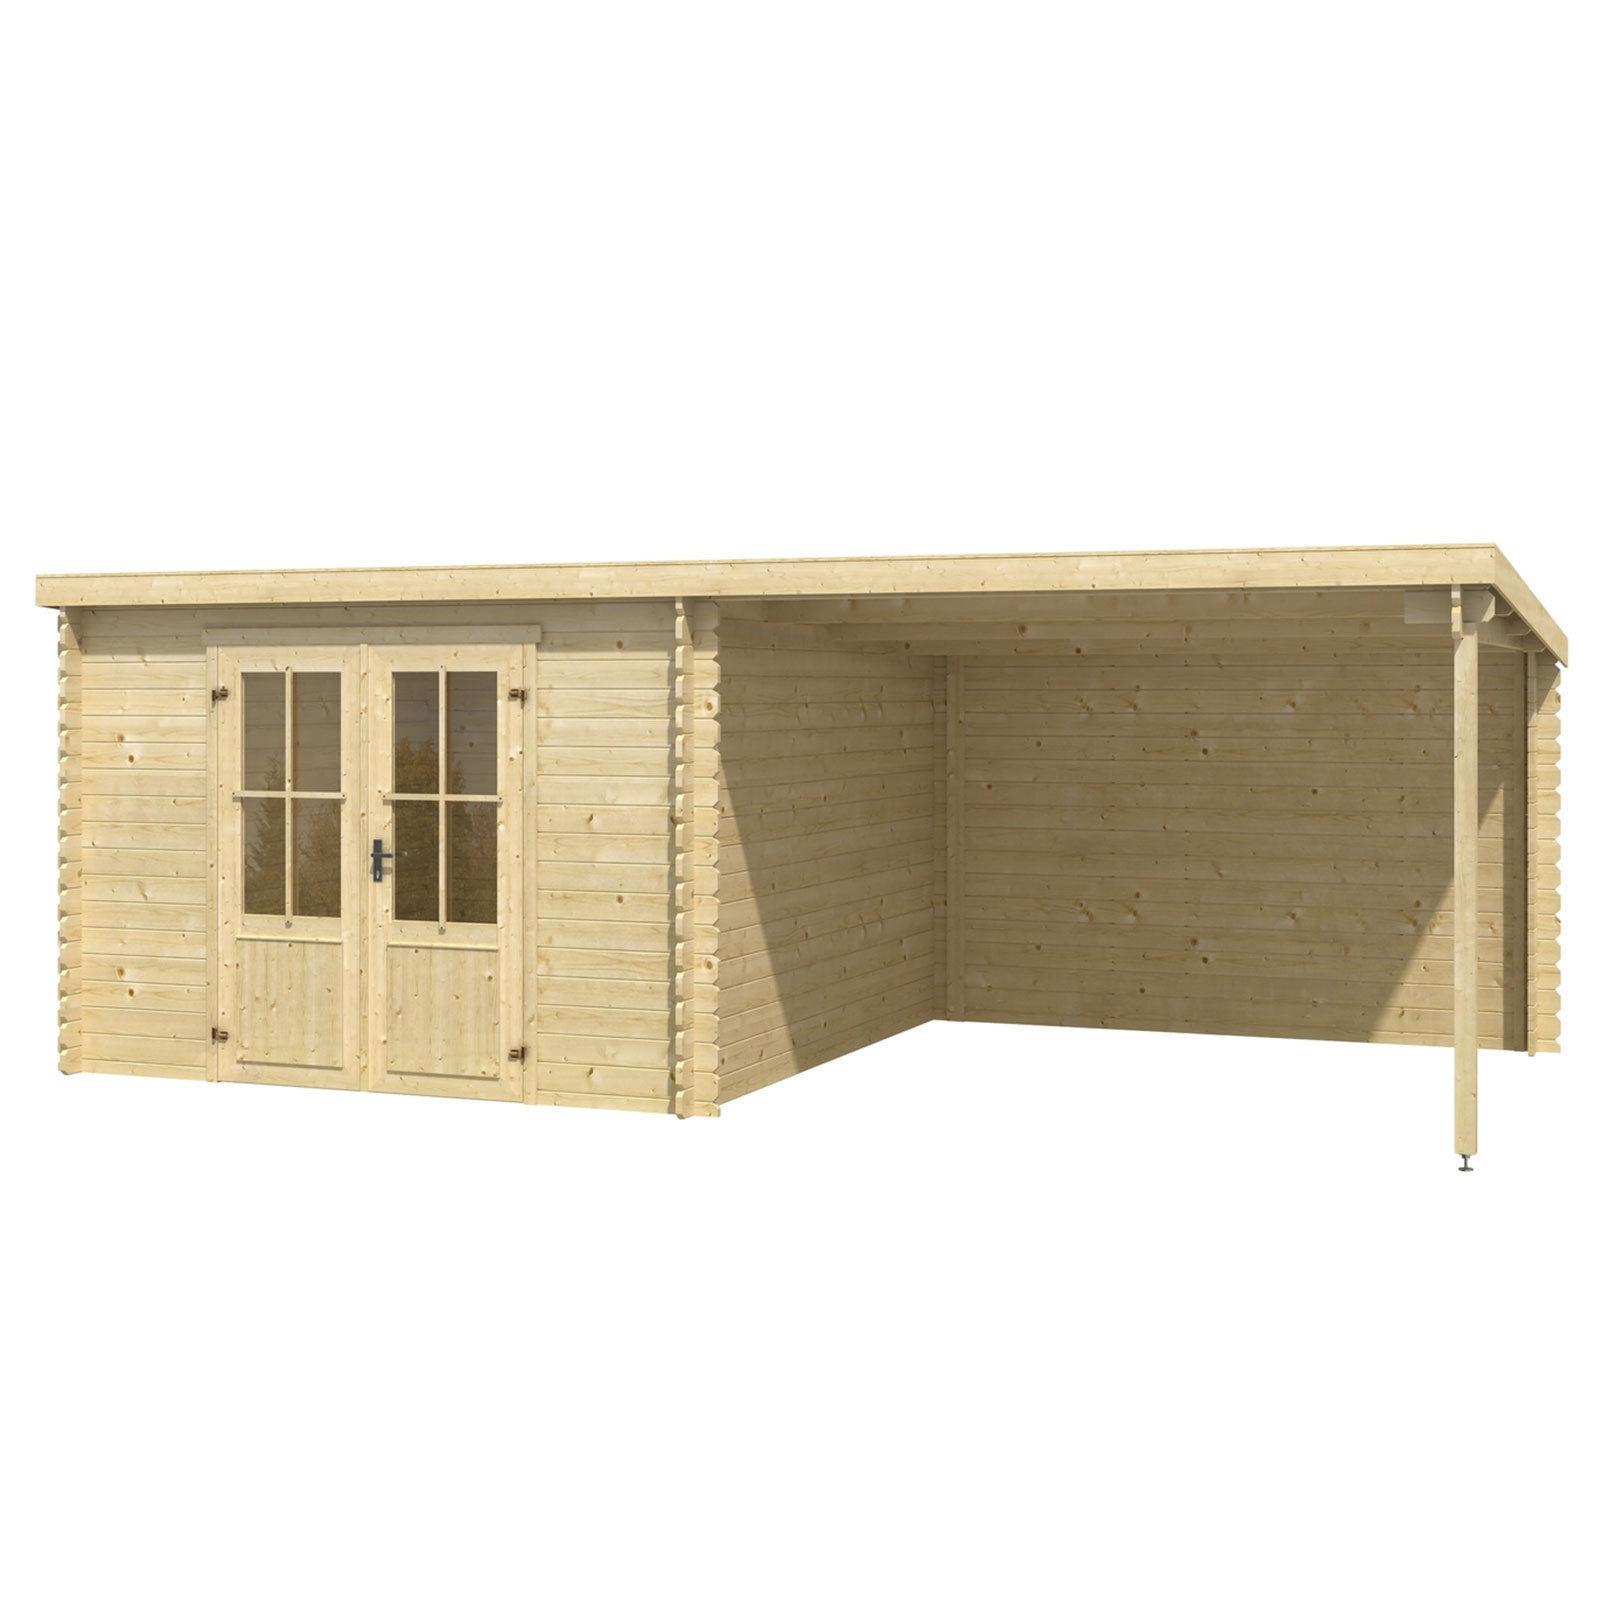 gartenhaus holzhaus ger tehaus schuppen lasita maja hori 19 mm 28 mm ebay. Black Bedroom Furniture Sets. Home Design Ideas